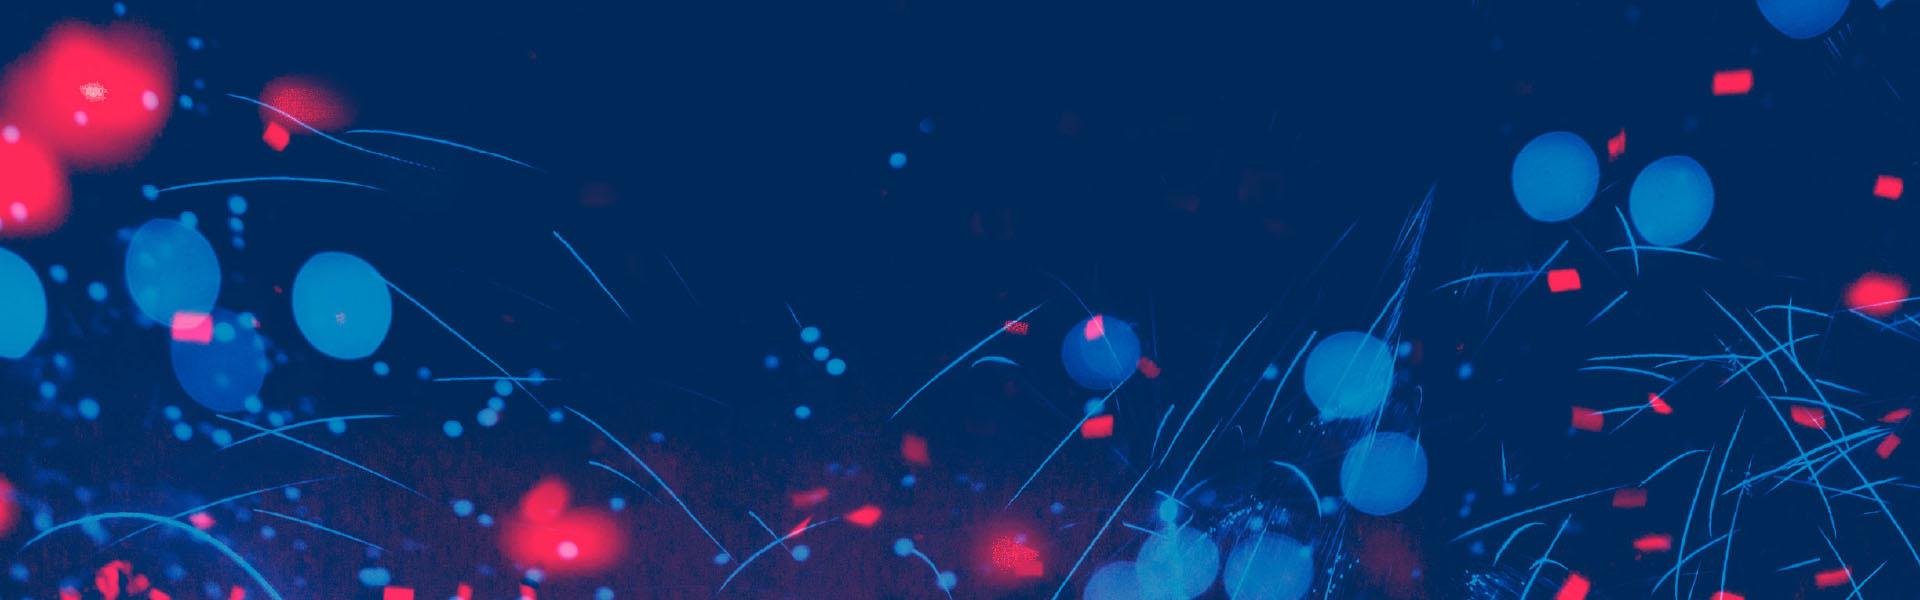 Auditel celebrates 25 years of innovation